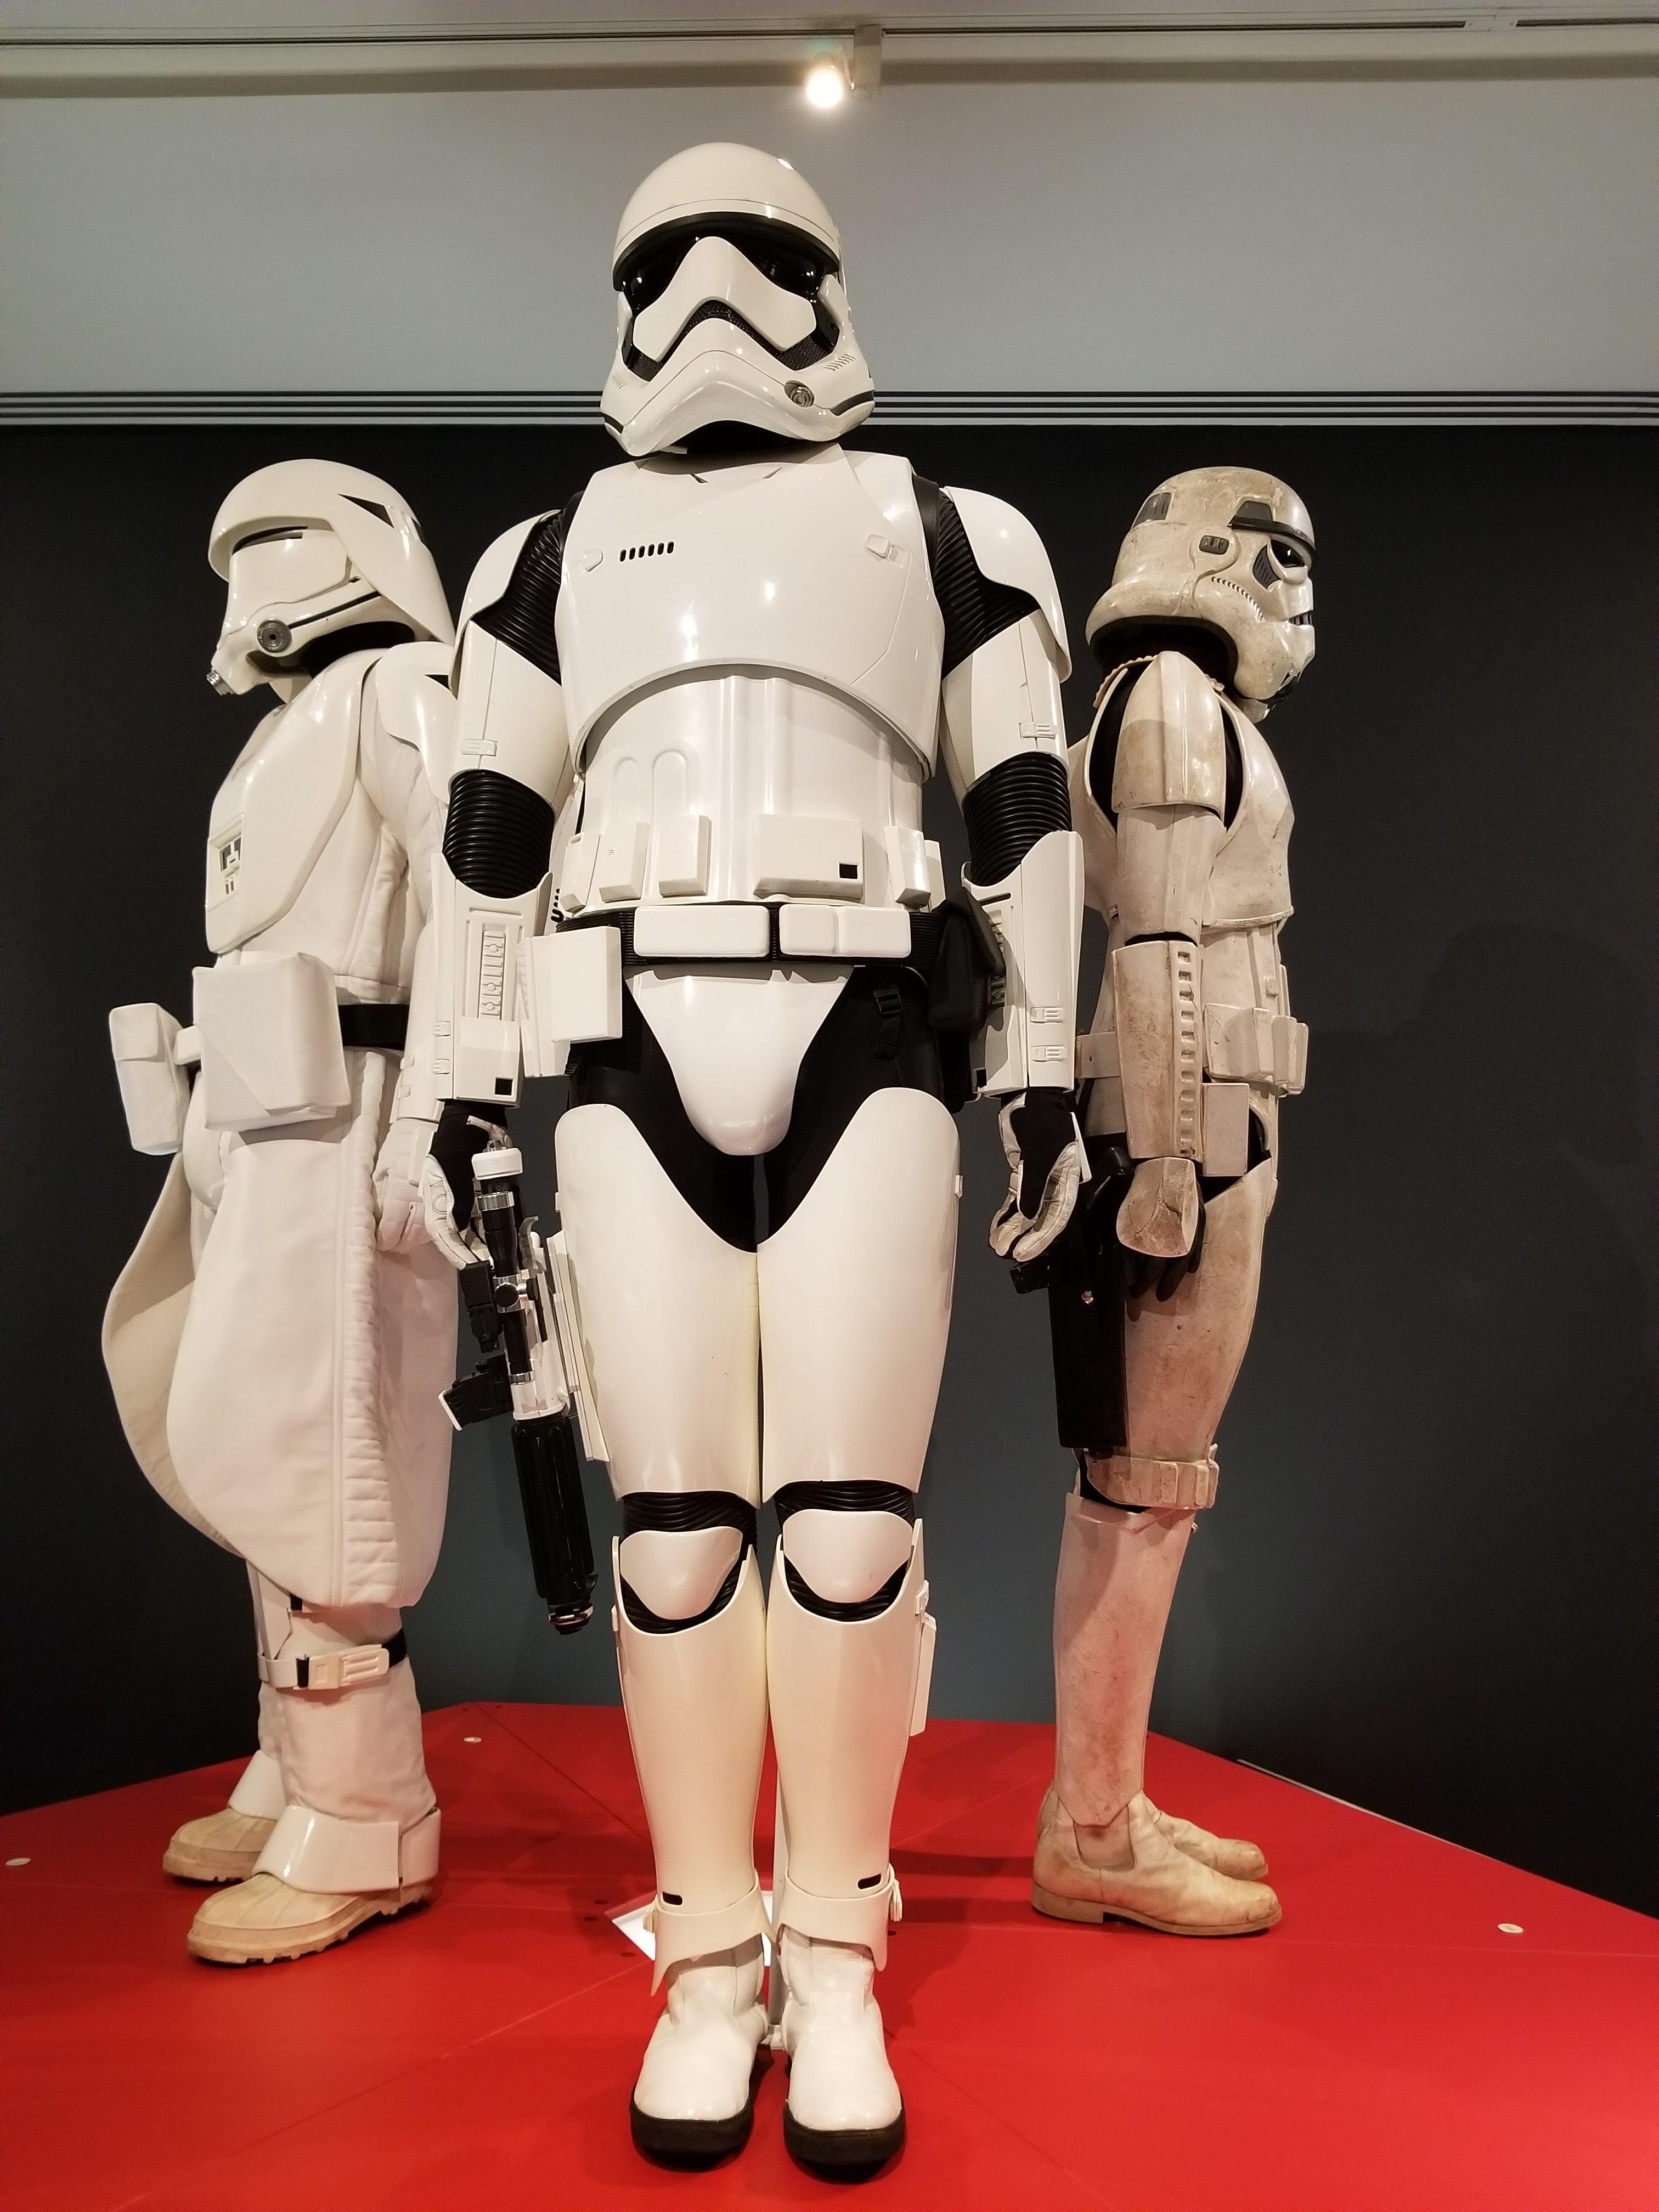 Smithsonian Star Wars Costume Tour